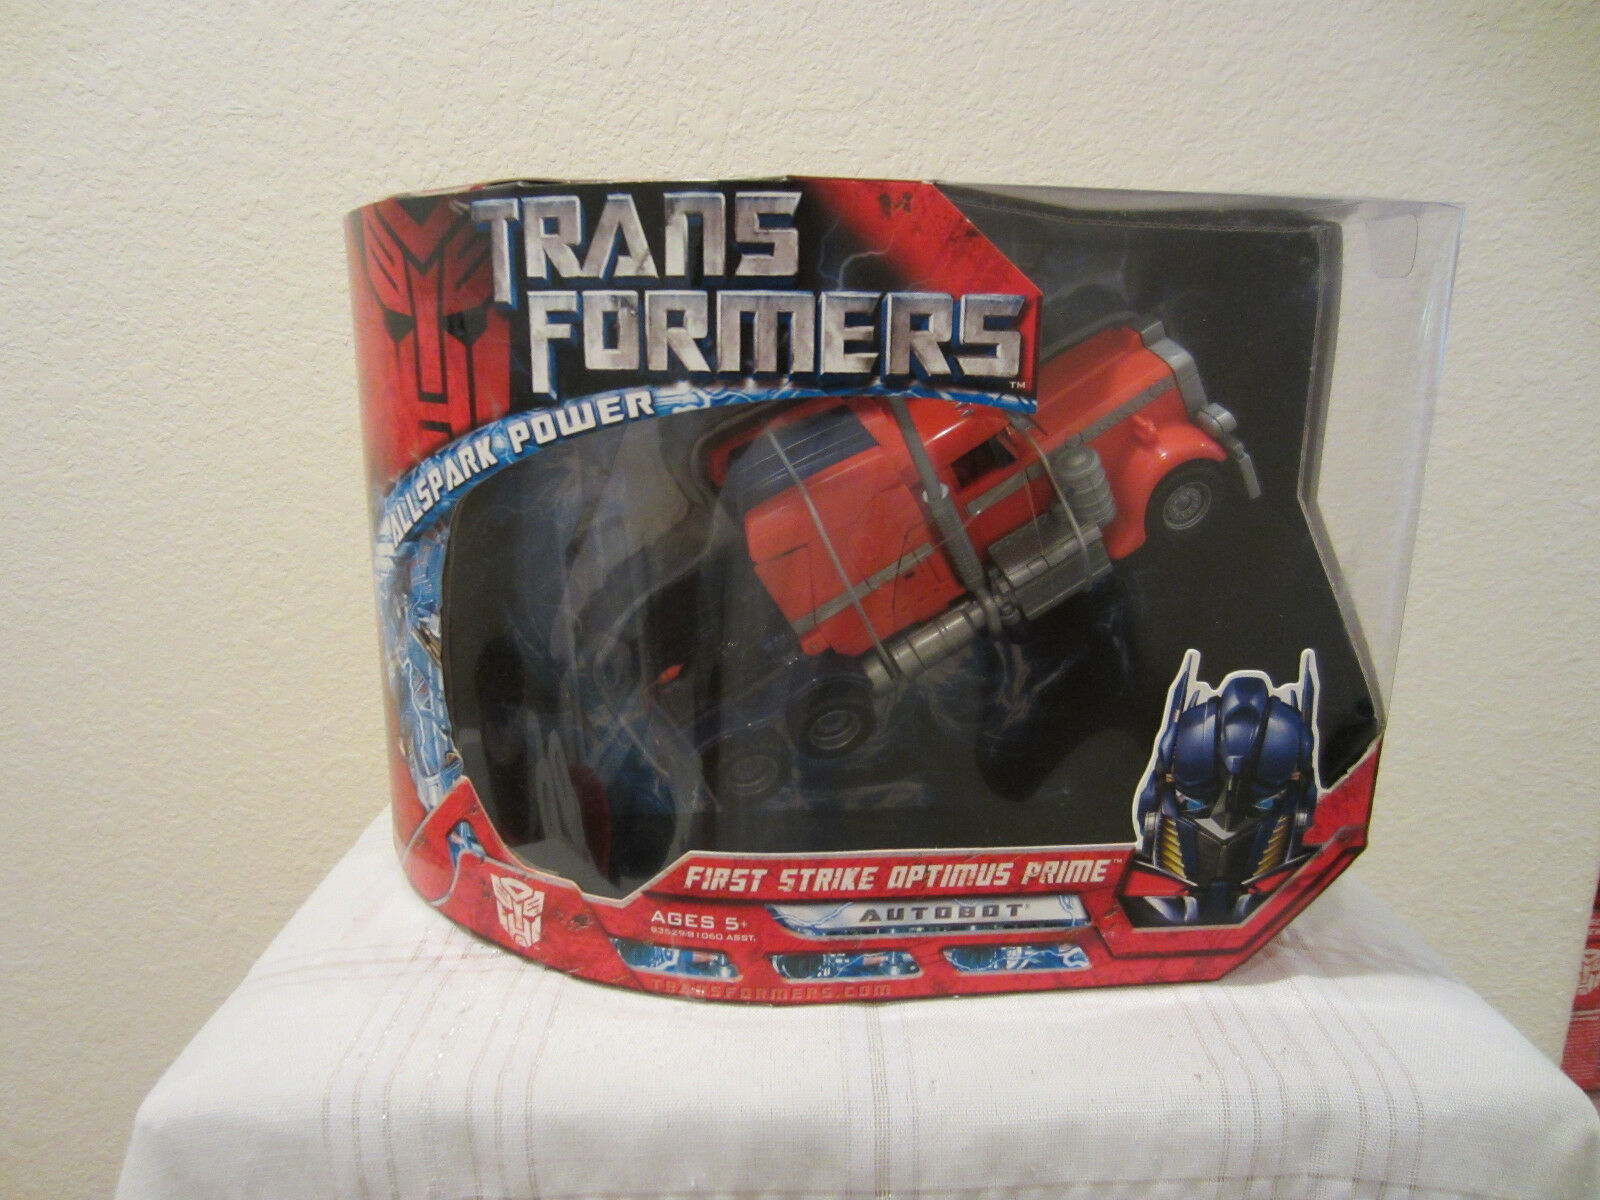 Hasbro Transformers Movie Voyager Class Autobot First Strike Optimus Prime MISB